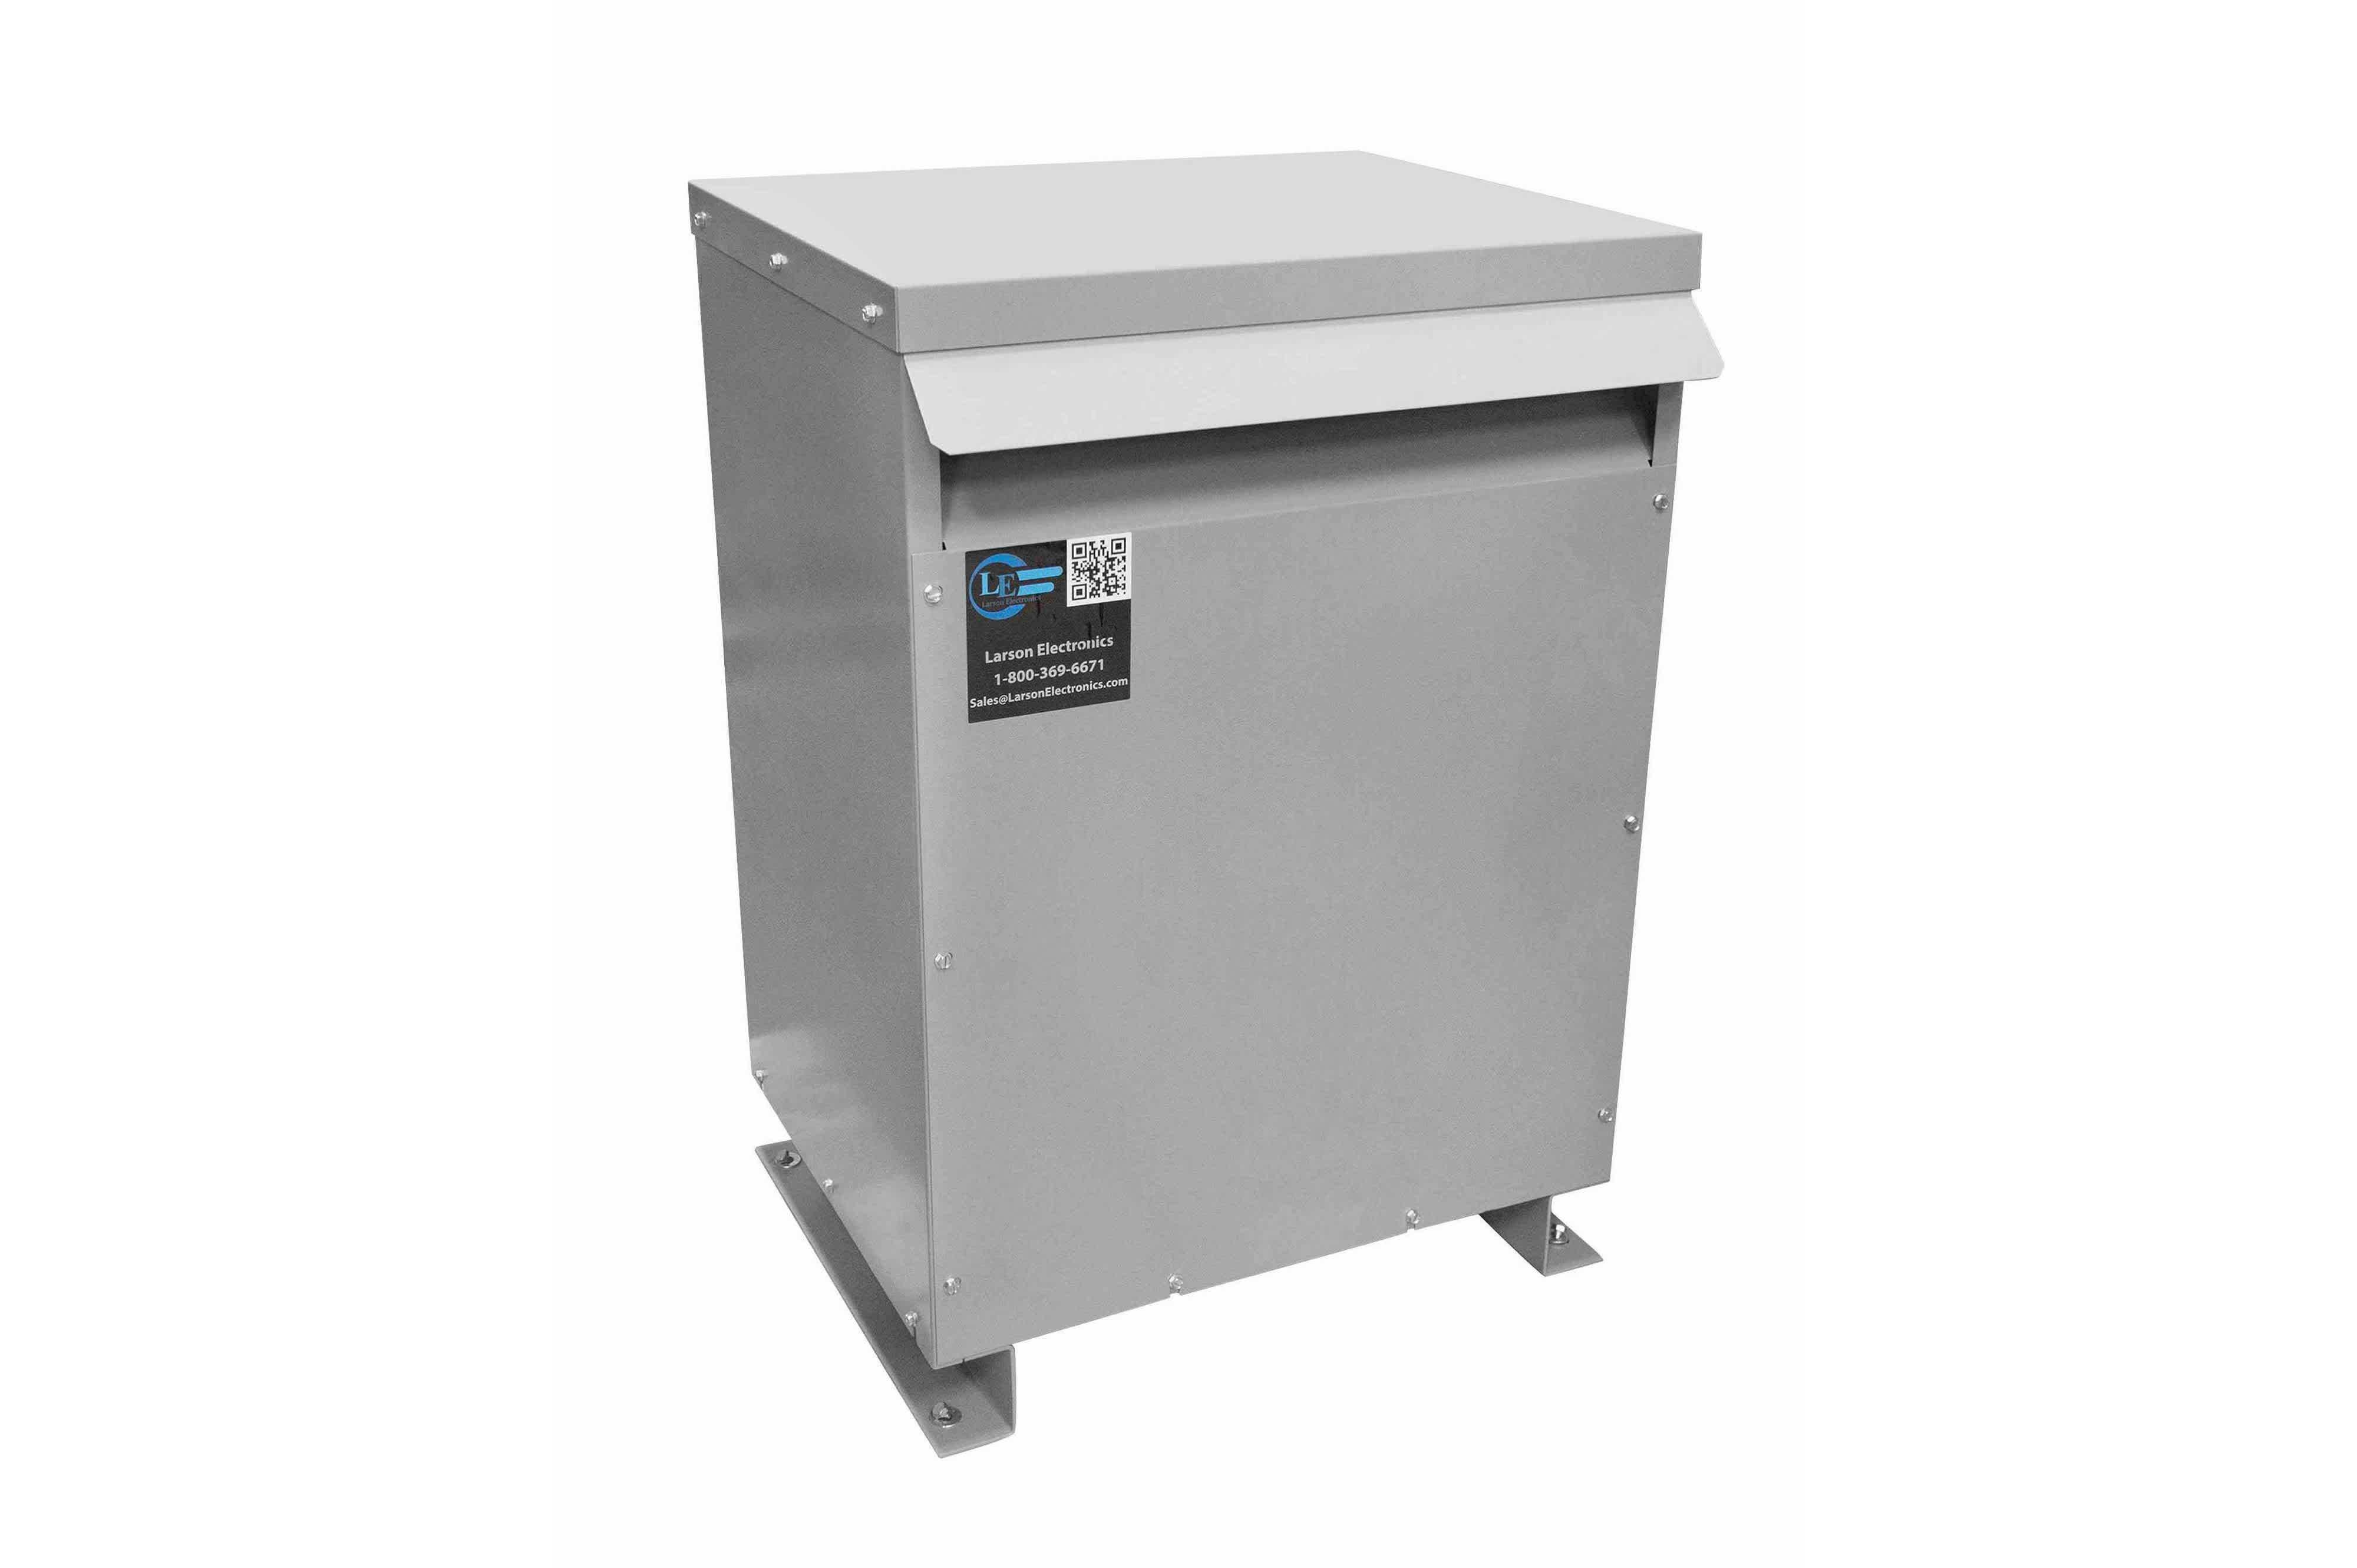 750 kVA 3PH DOE Transformer, 415V Delta Primary, 480Y/277 Wye-N Secondary, N3R, Ventilated, 60 Hz